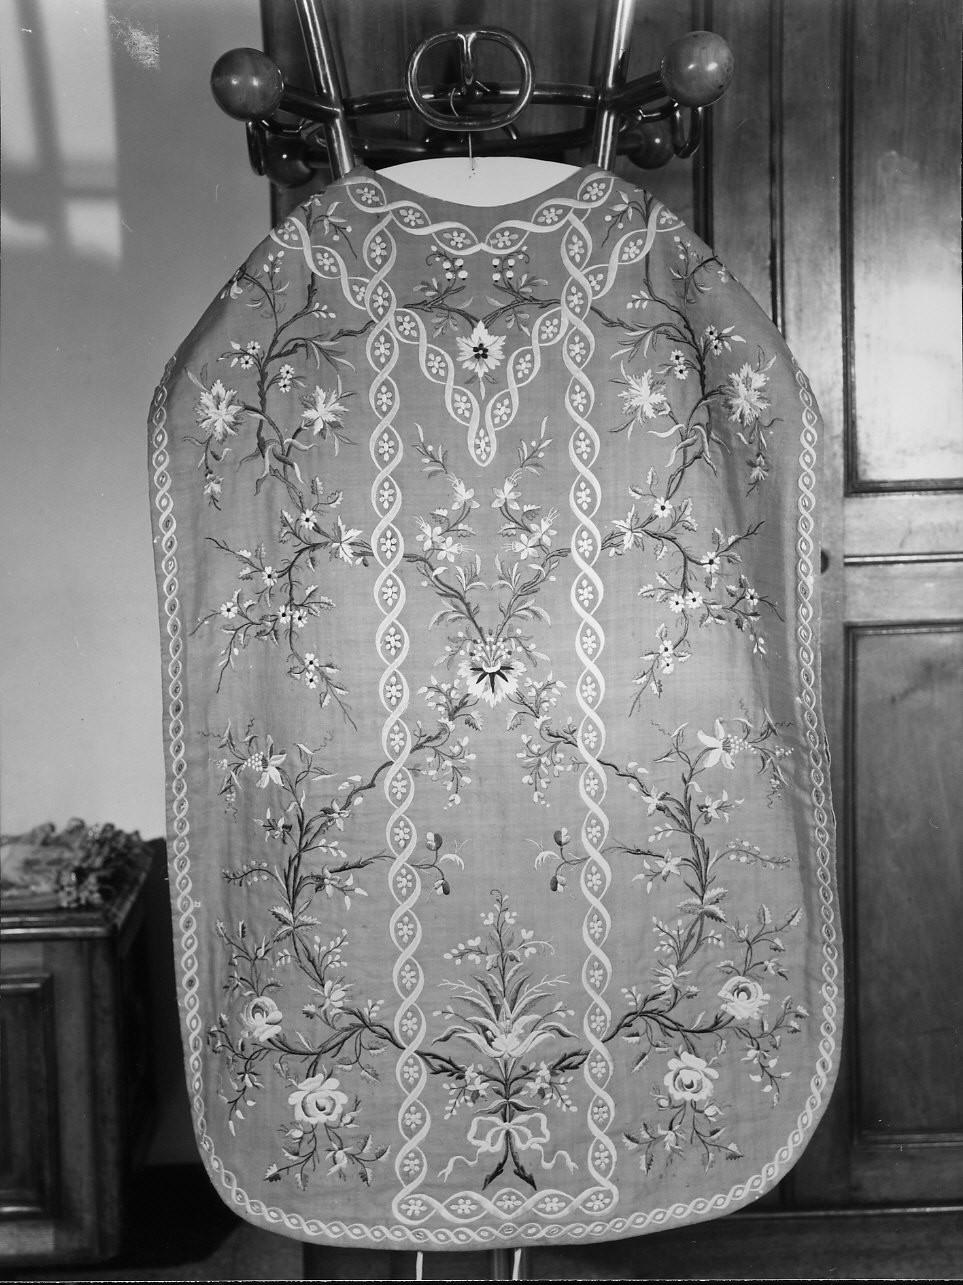 motivi decorativi floreali (paramento liturgico, insieme) - manifattura ligure (primo quarto sec. XX)